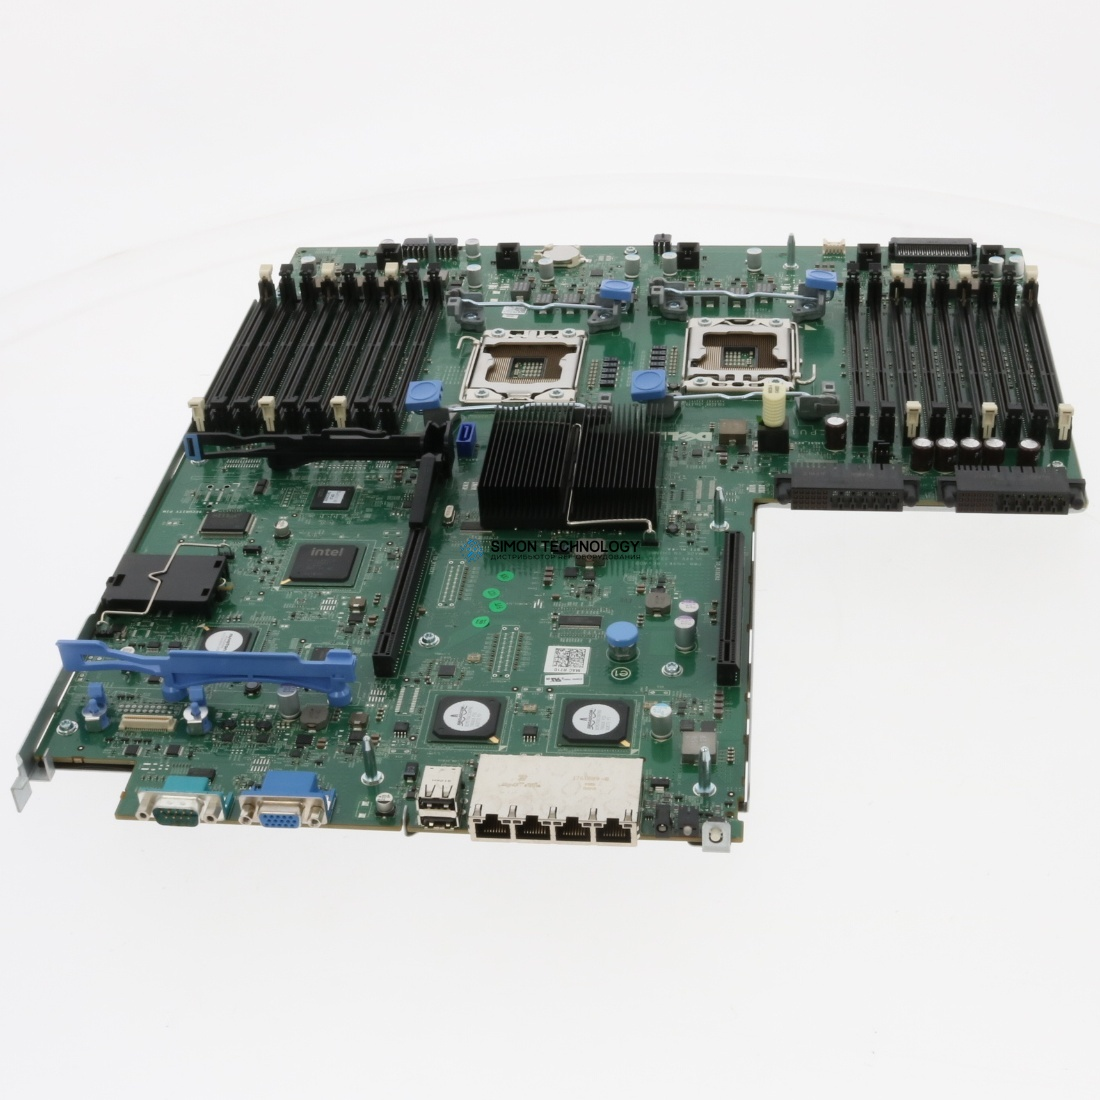 Материнская плата Dell PowerEdge R710 8x2.5 N047H Ask for custom qoute (PER710-SFF-8-N047H)